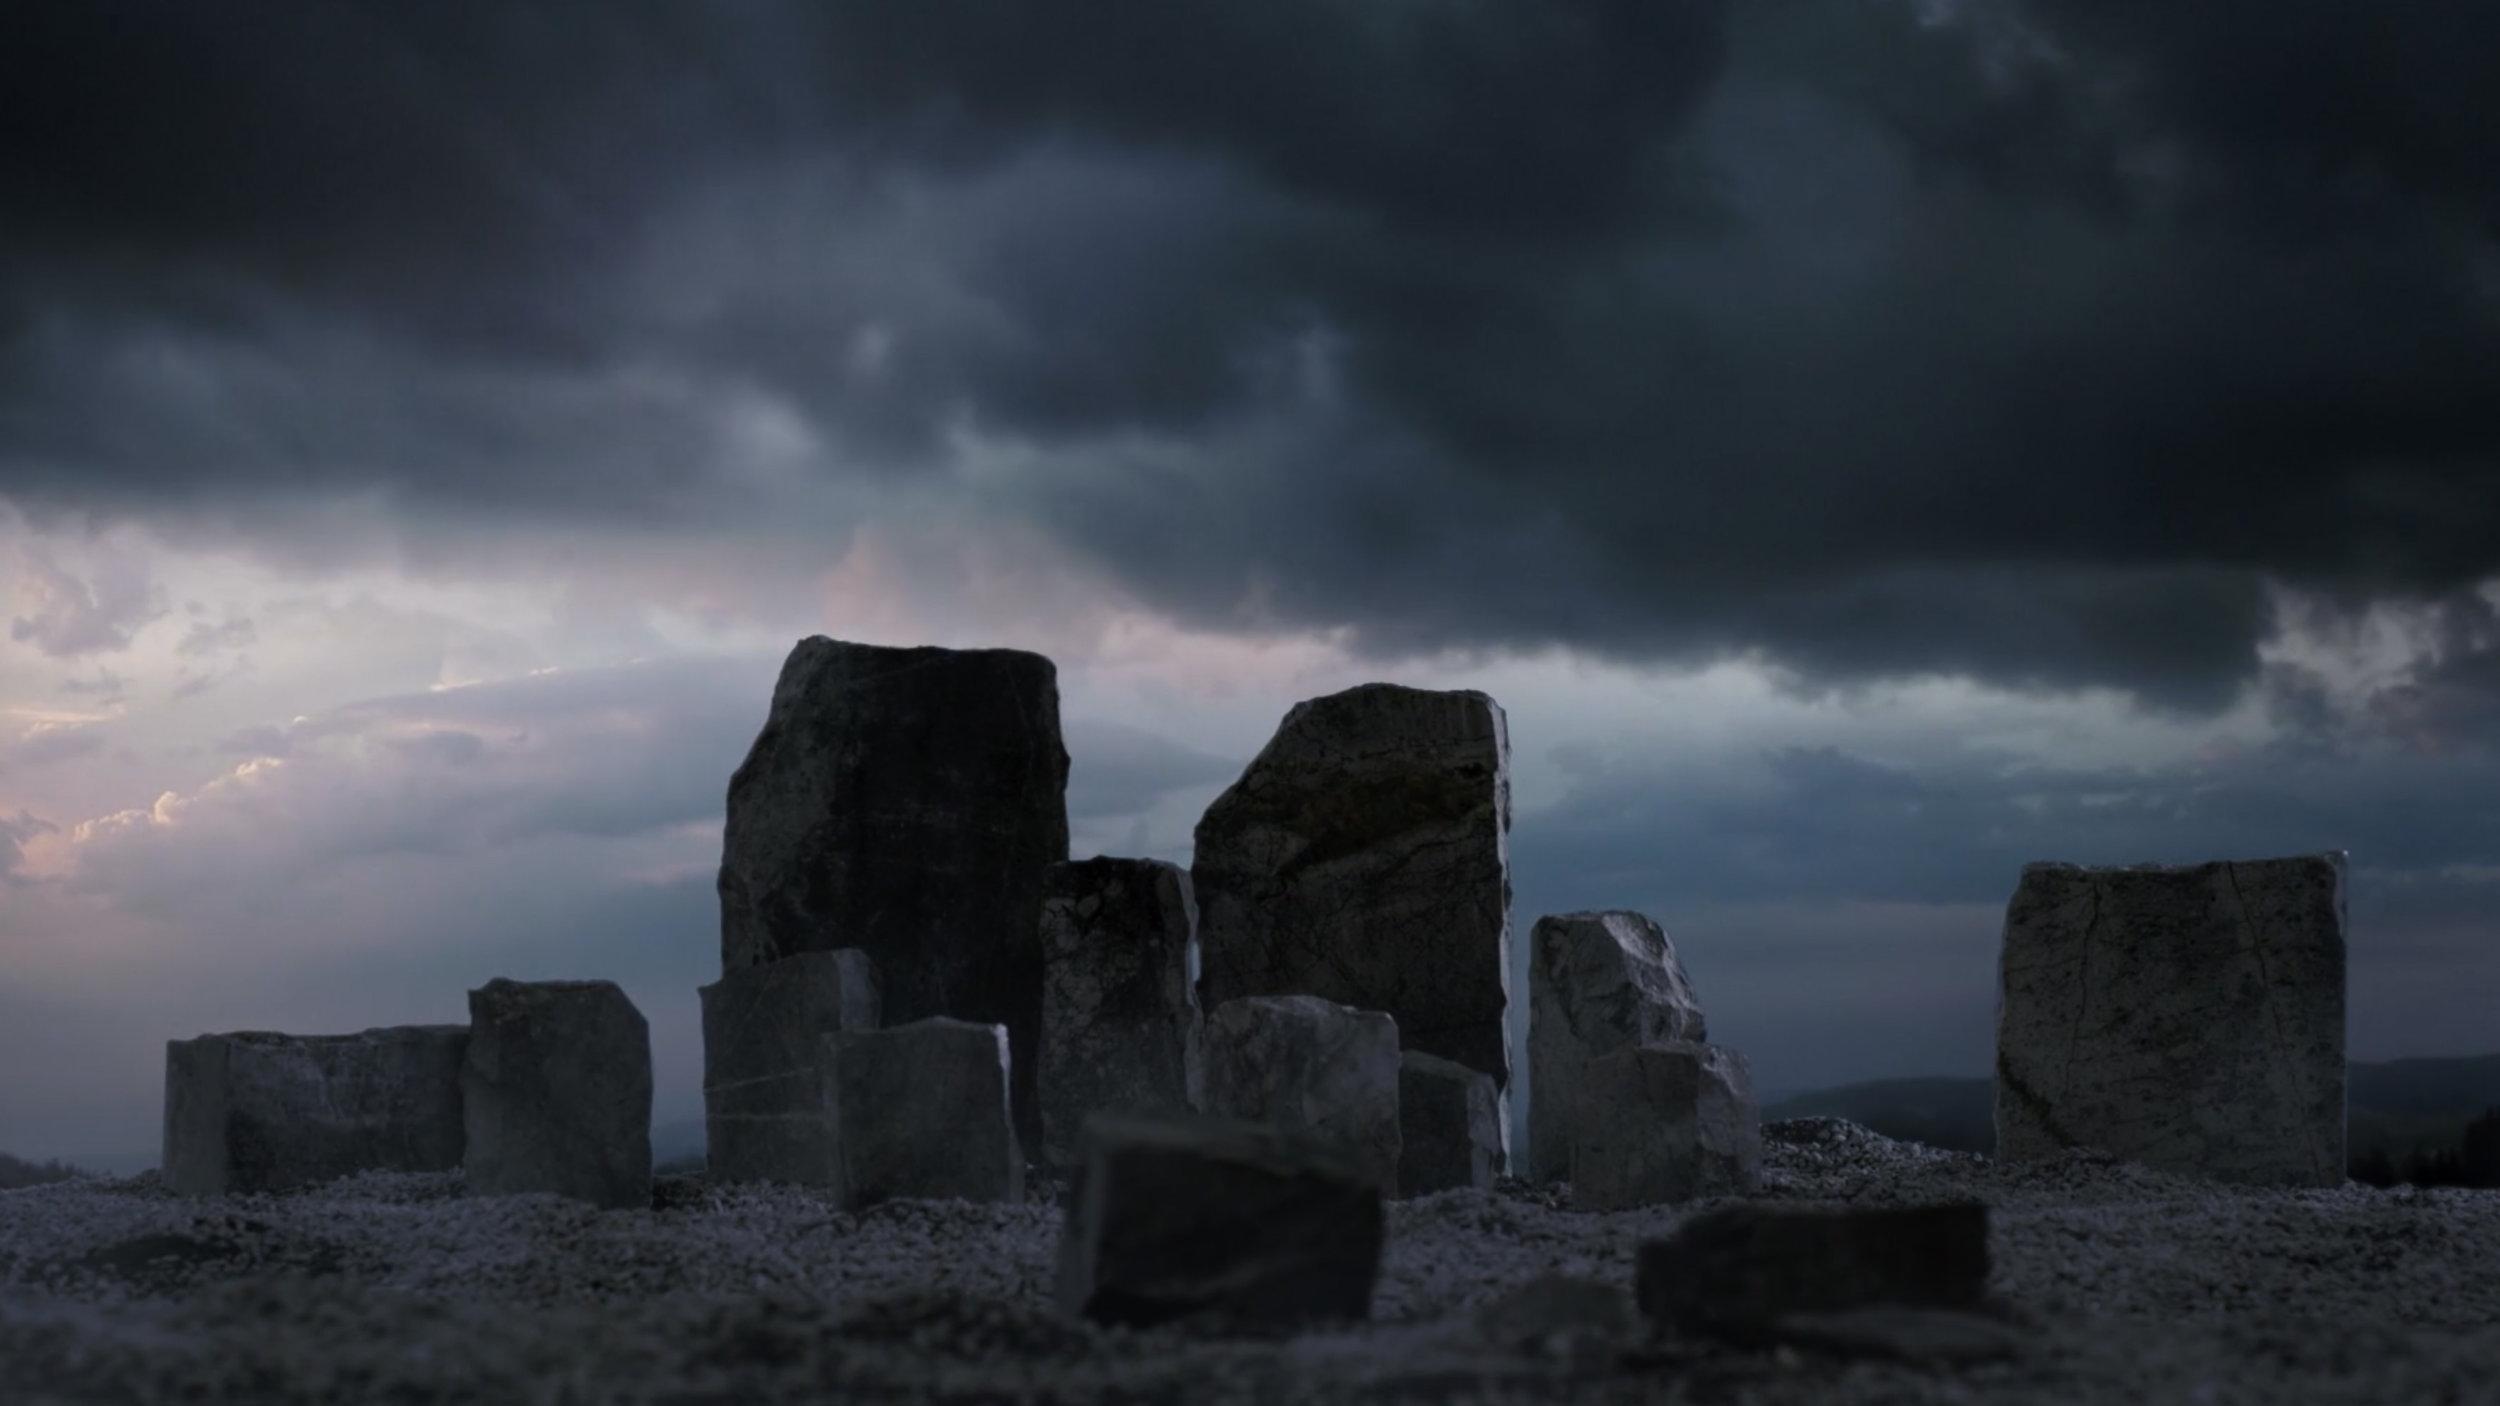 Strassers Stonemotion - Imagefilm